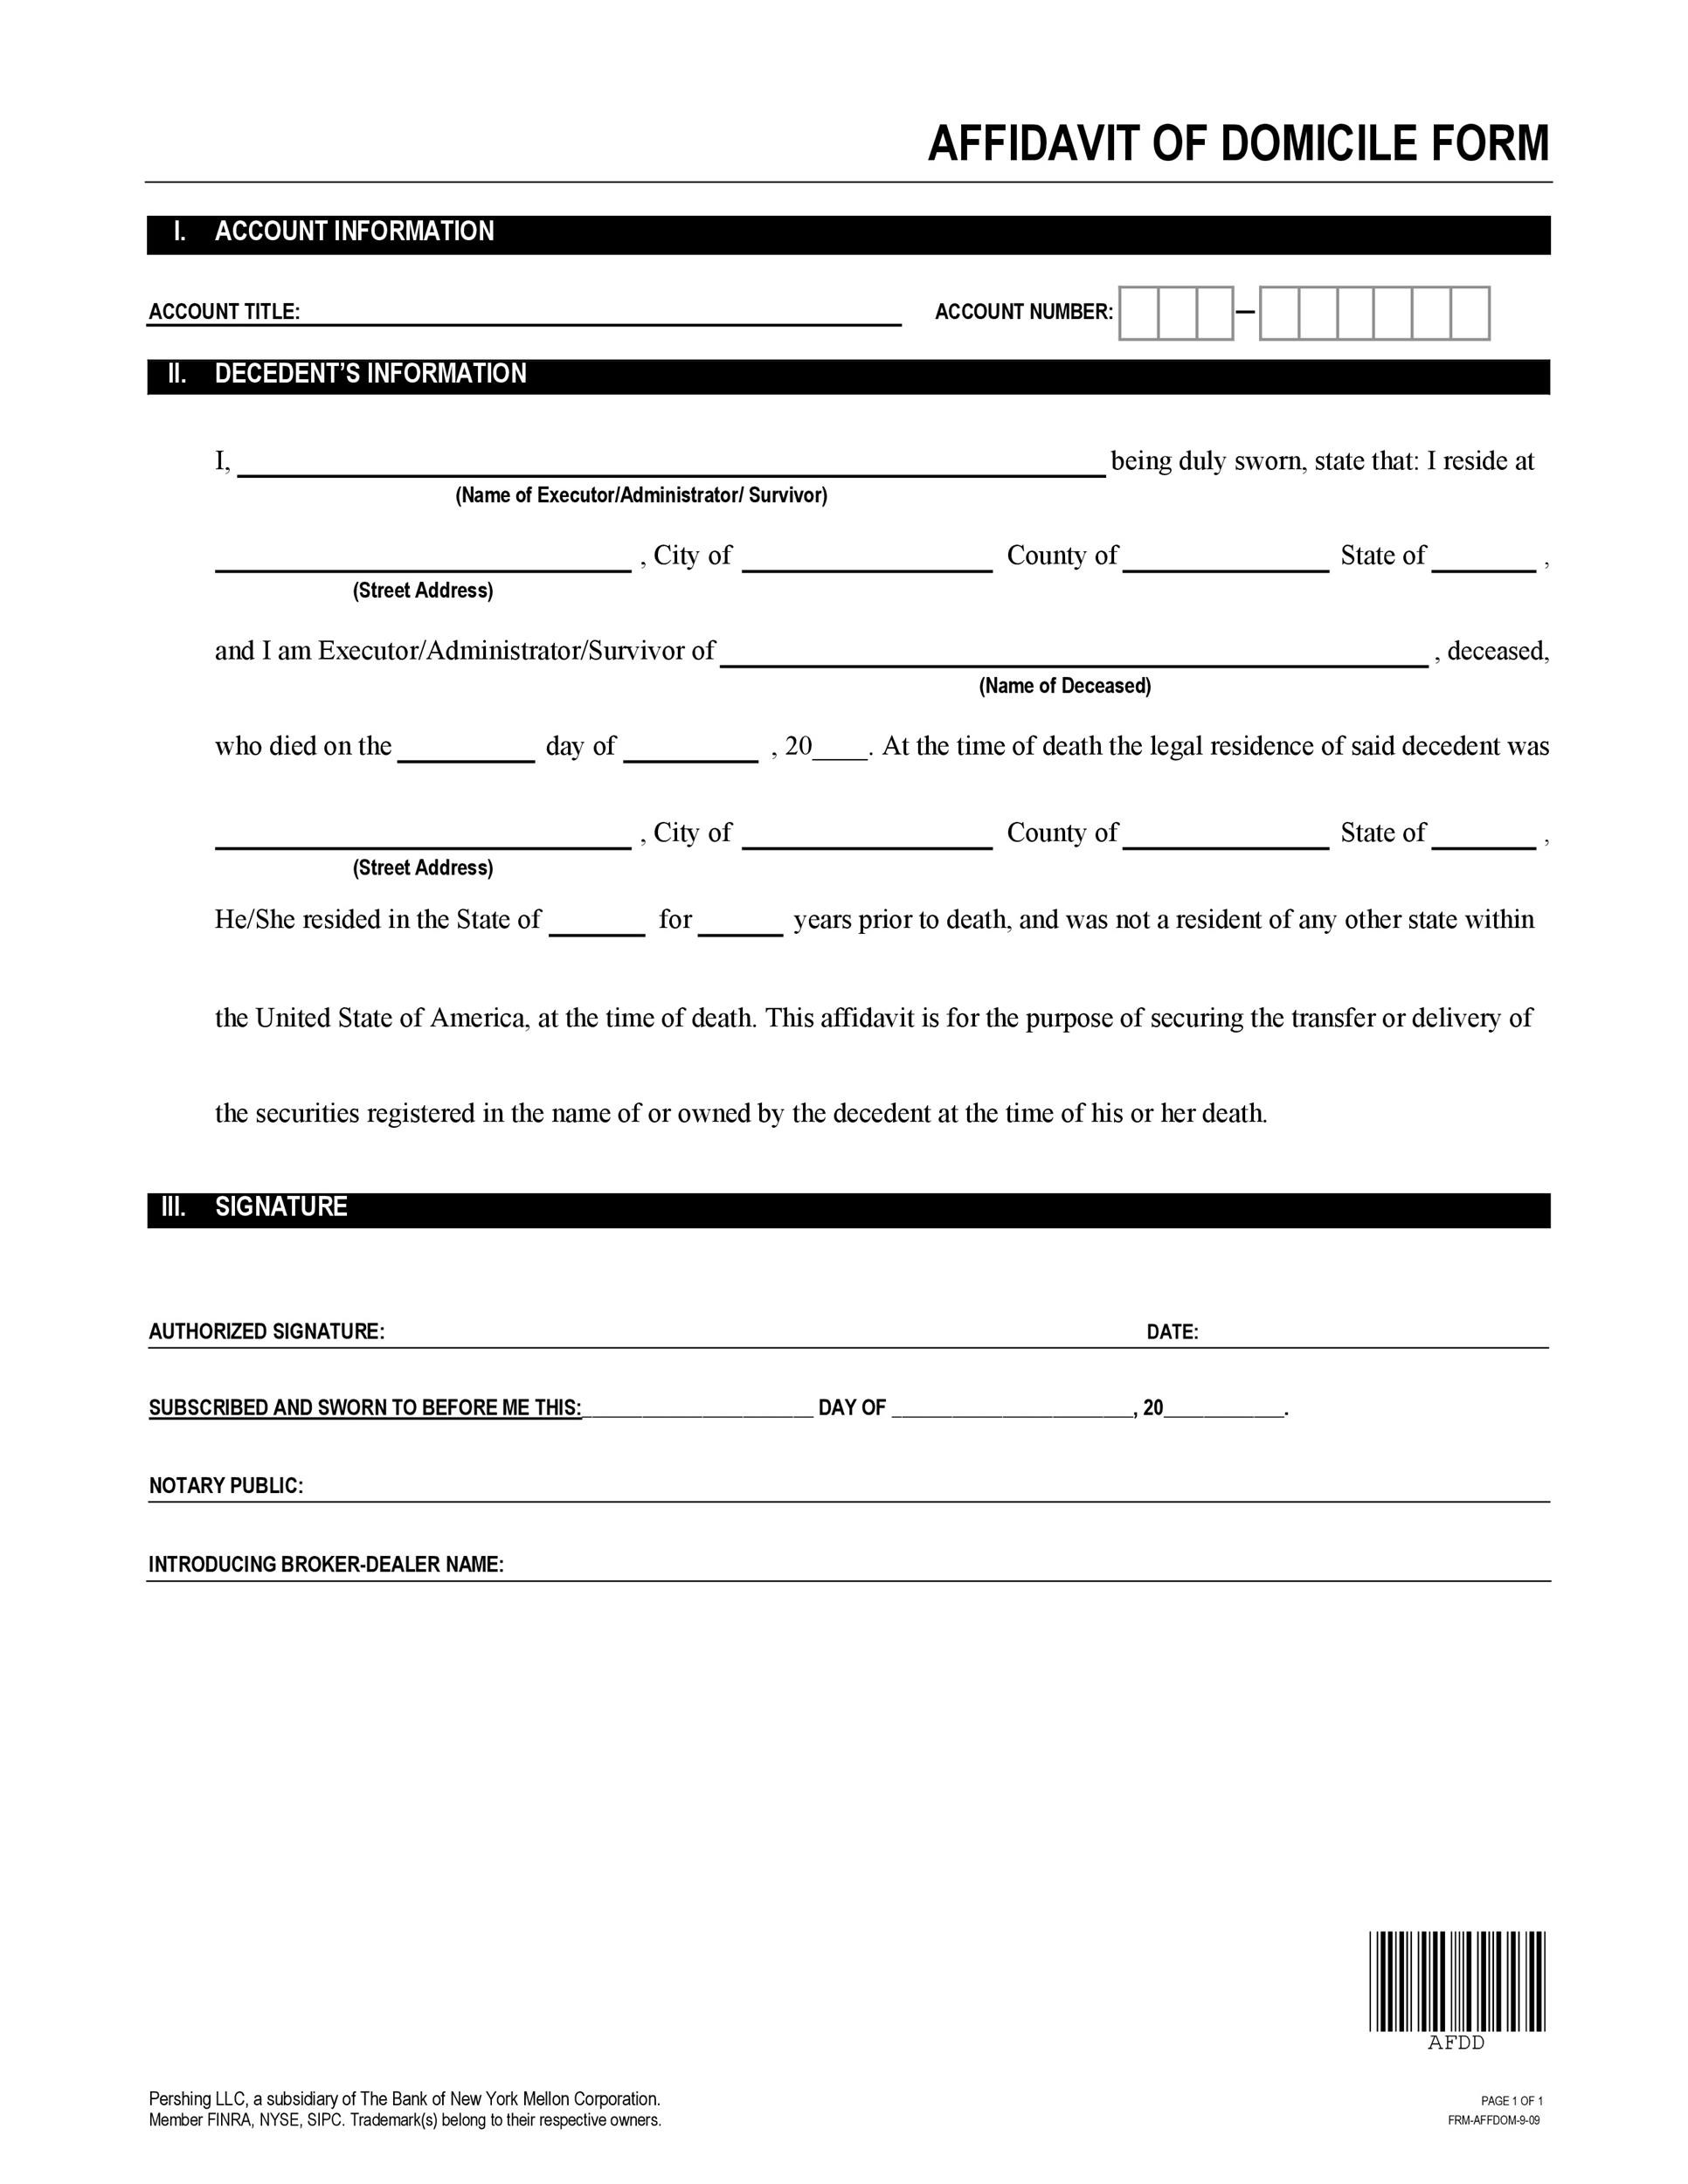 Free affidavit of domicile 09